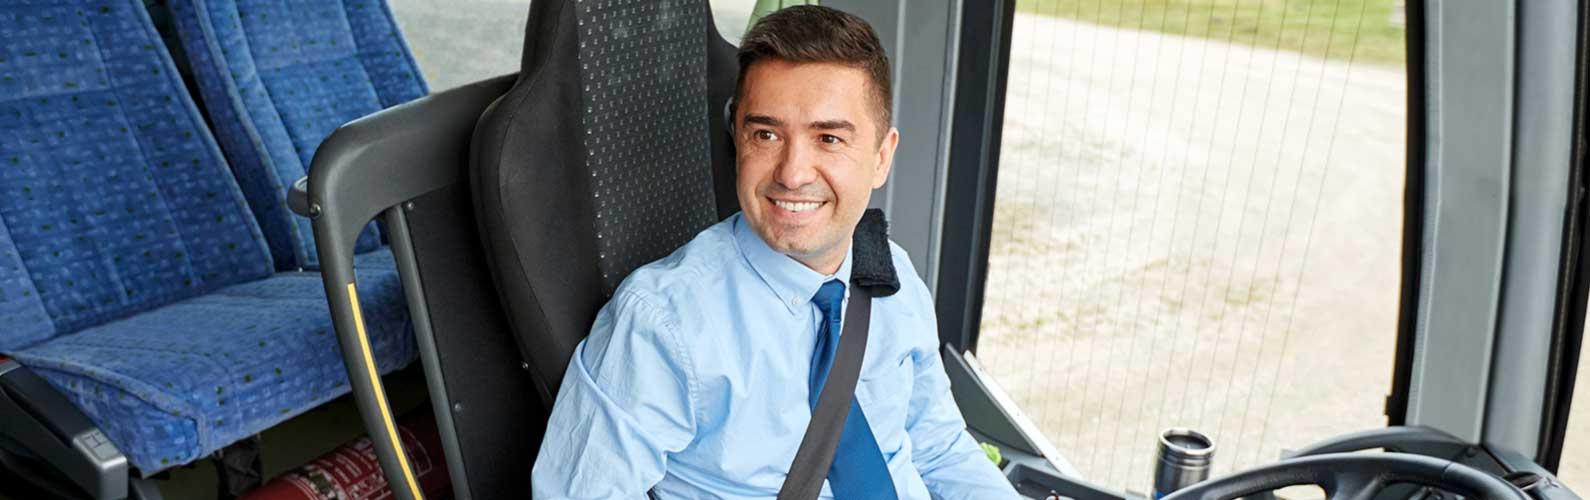 EC Rider Bus Driver